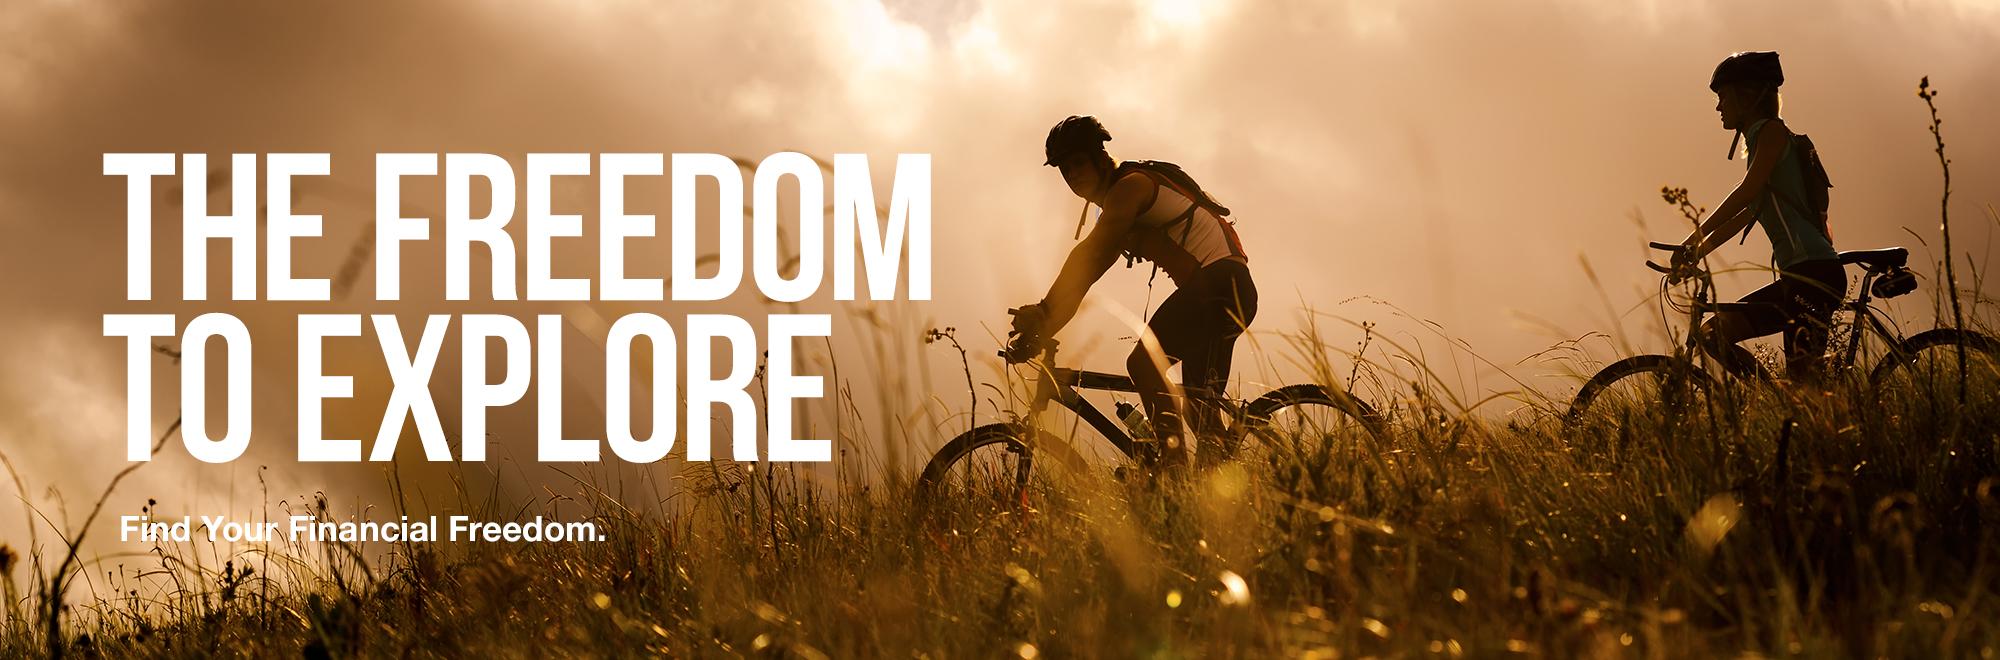 2017 Mountain Bike – Free to Be